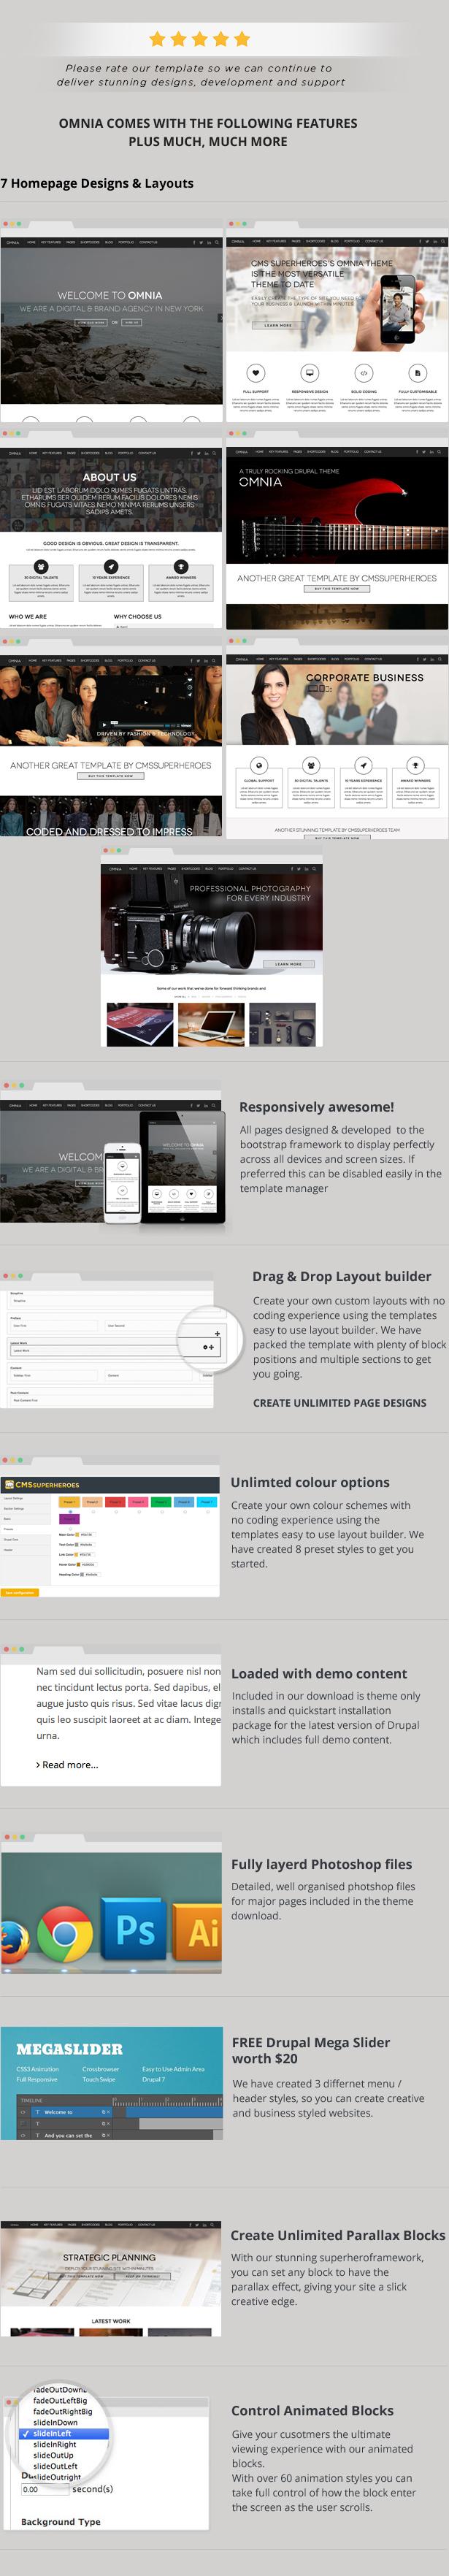 Omnia - Multi Purpose Agency Drupal Theme - 2